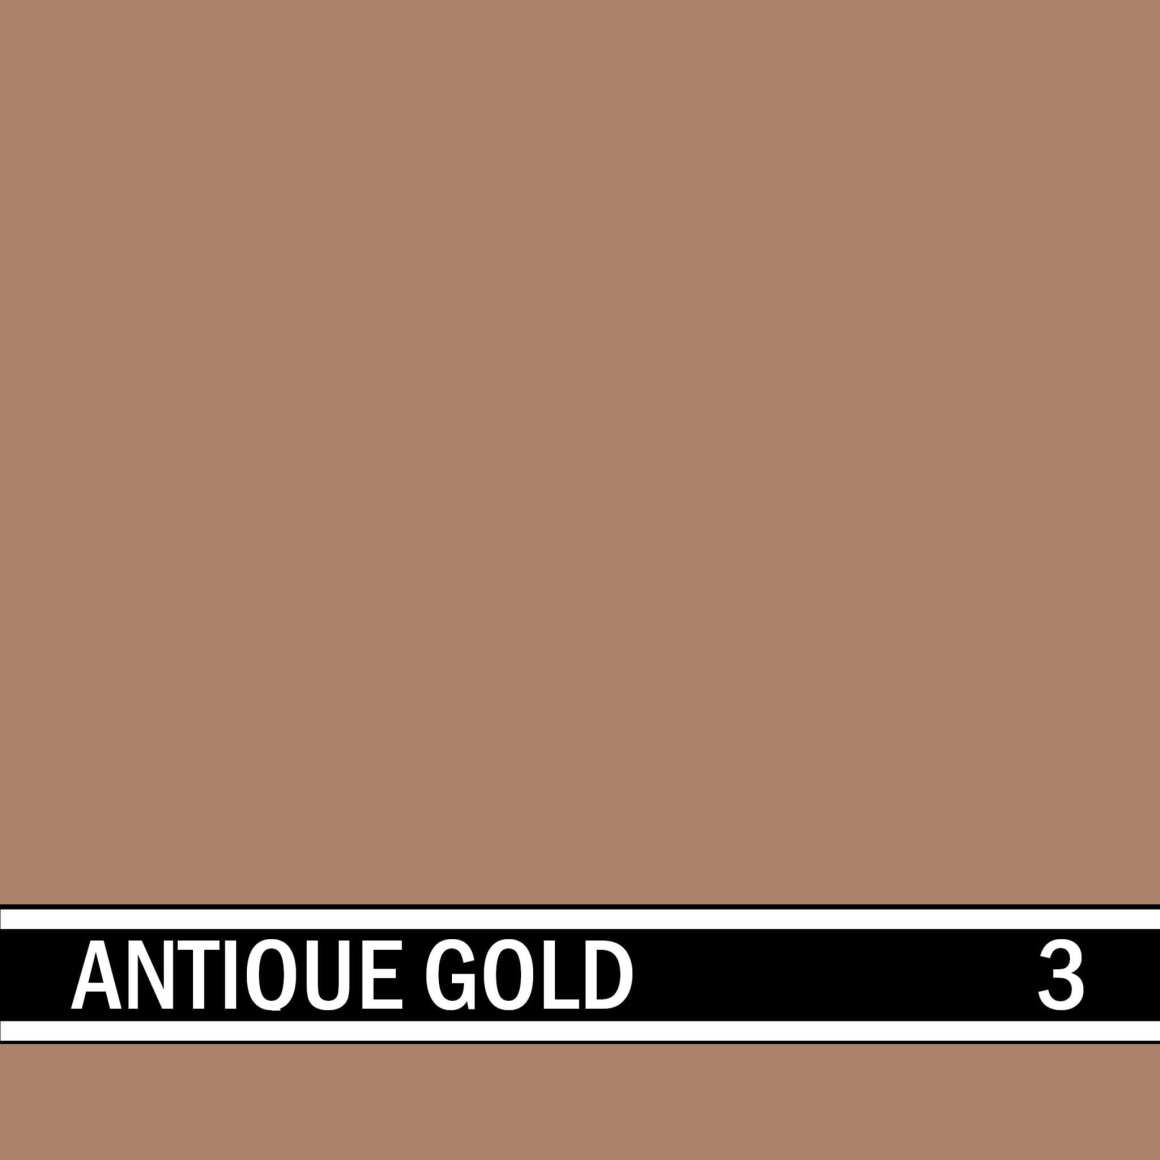 Antique Gold integral concrete color for stamped concrete and decorative colored concrete